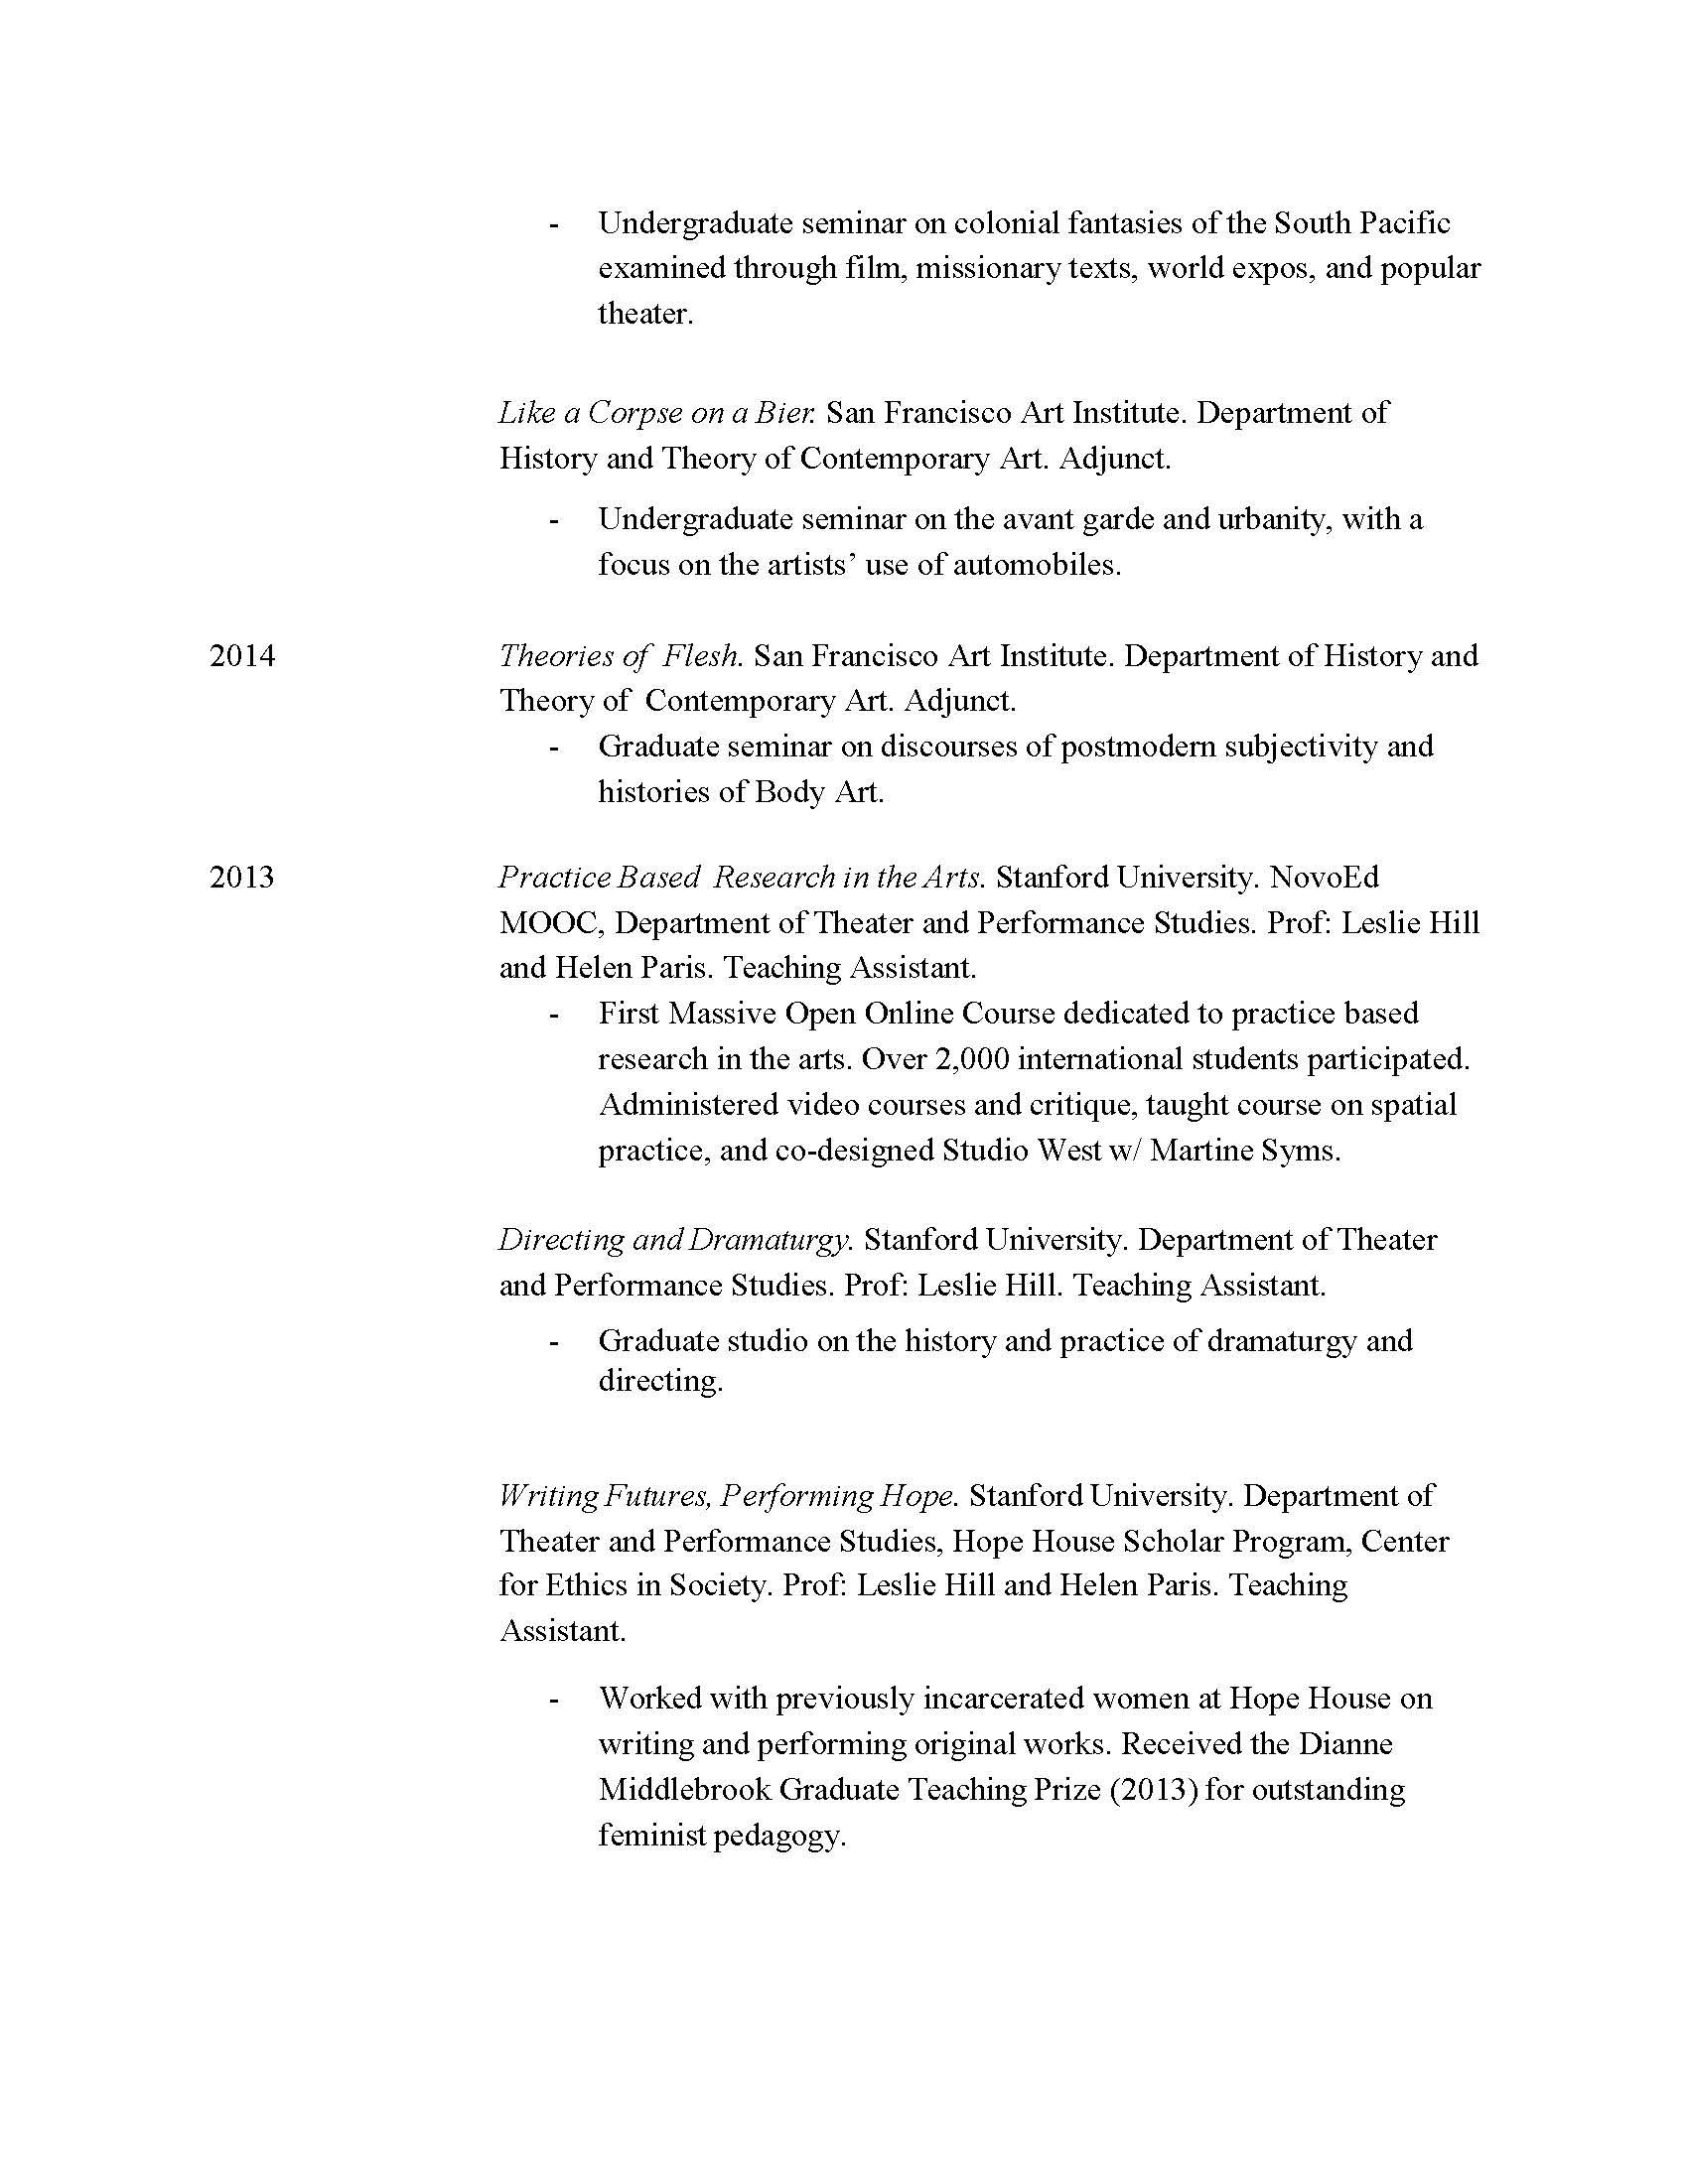 Ryan D Tacata CV (Updated 1-2019)_Page_3.jpg